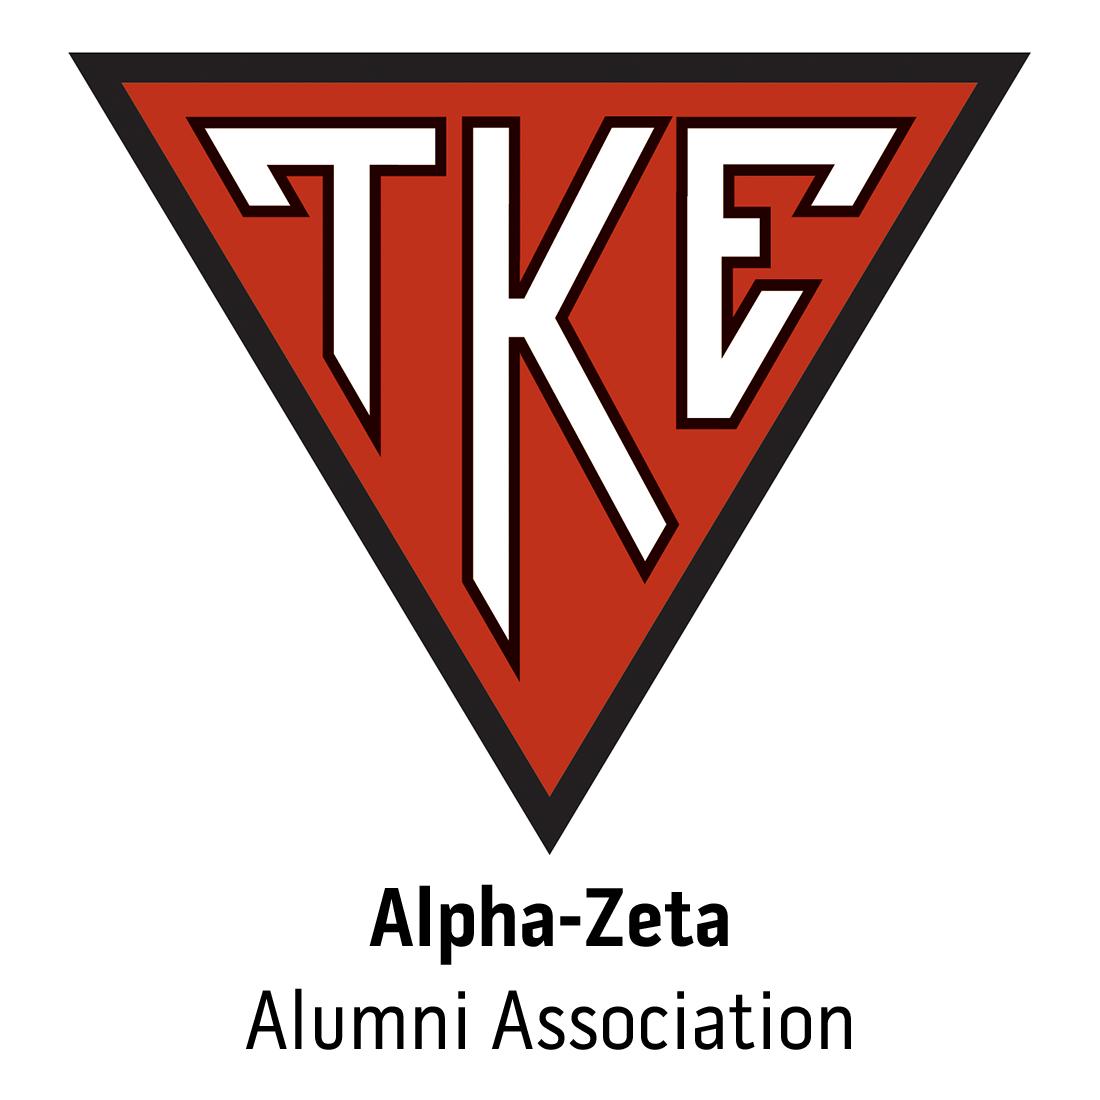 Alpha-Zeta Alumni Association at Purdue University